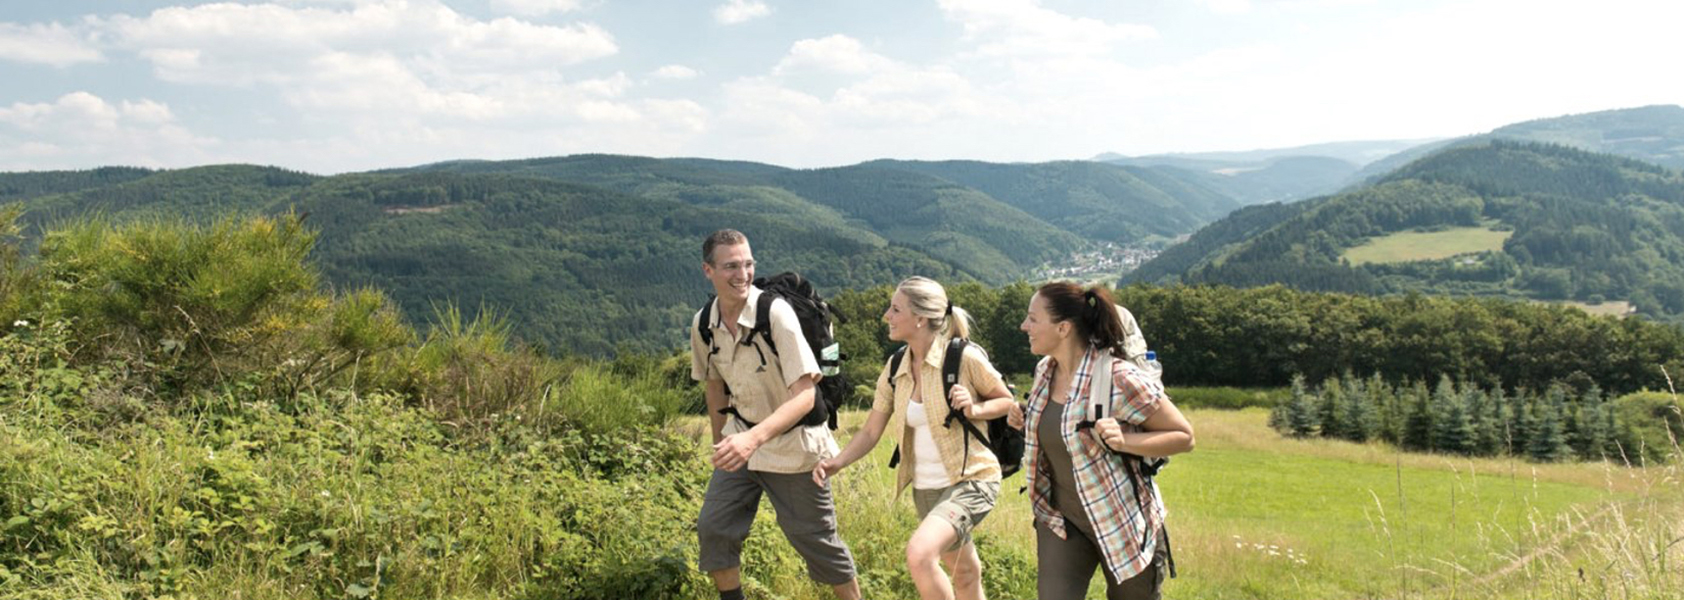 Duitsland | Wandelen over de rotweinwanderweg